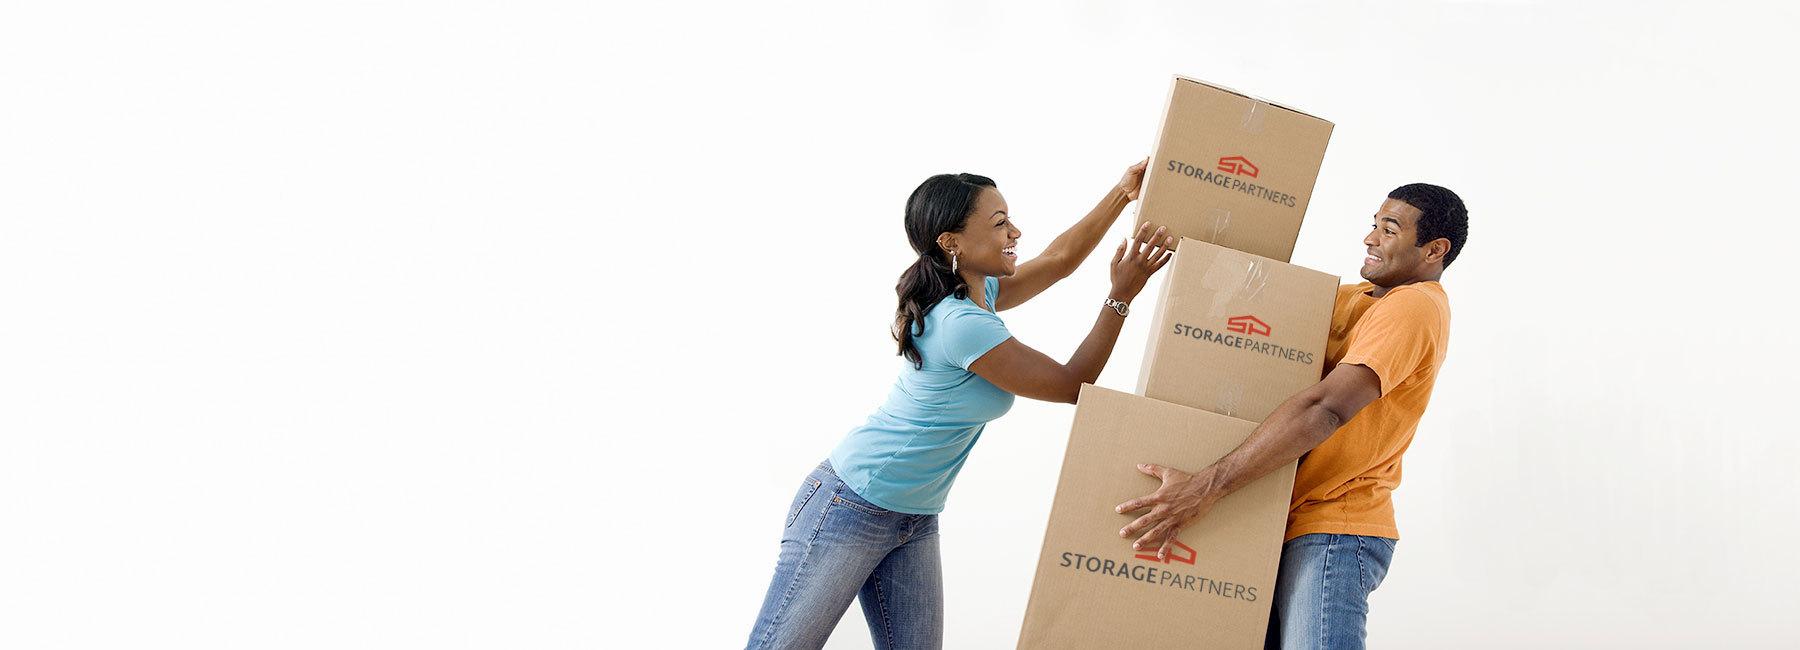 Storage Partners